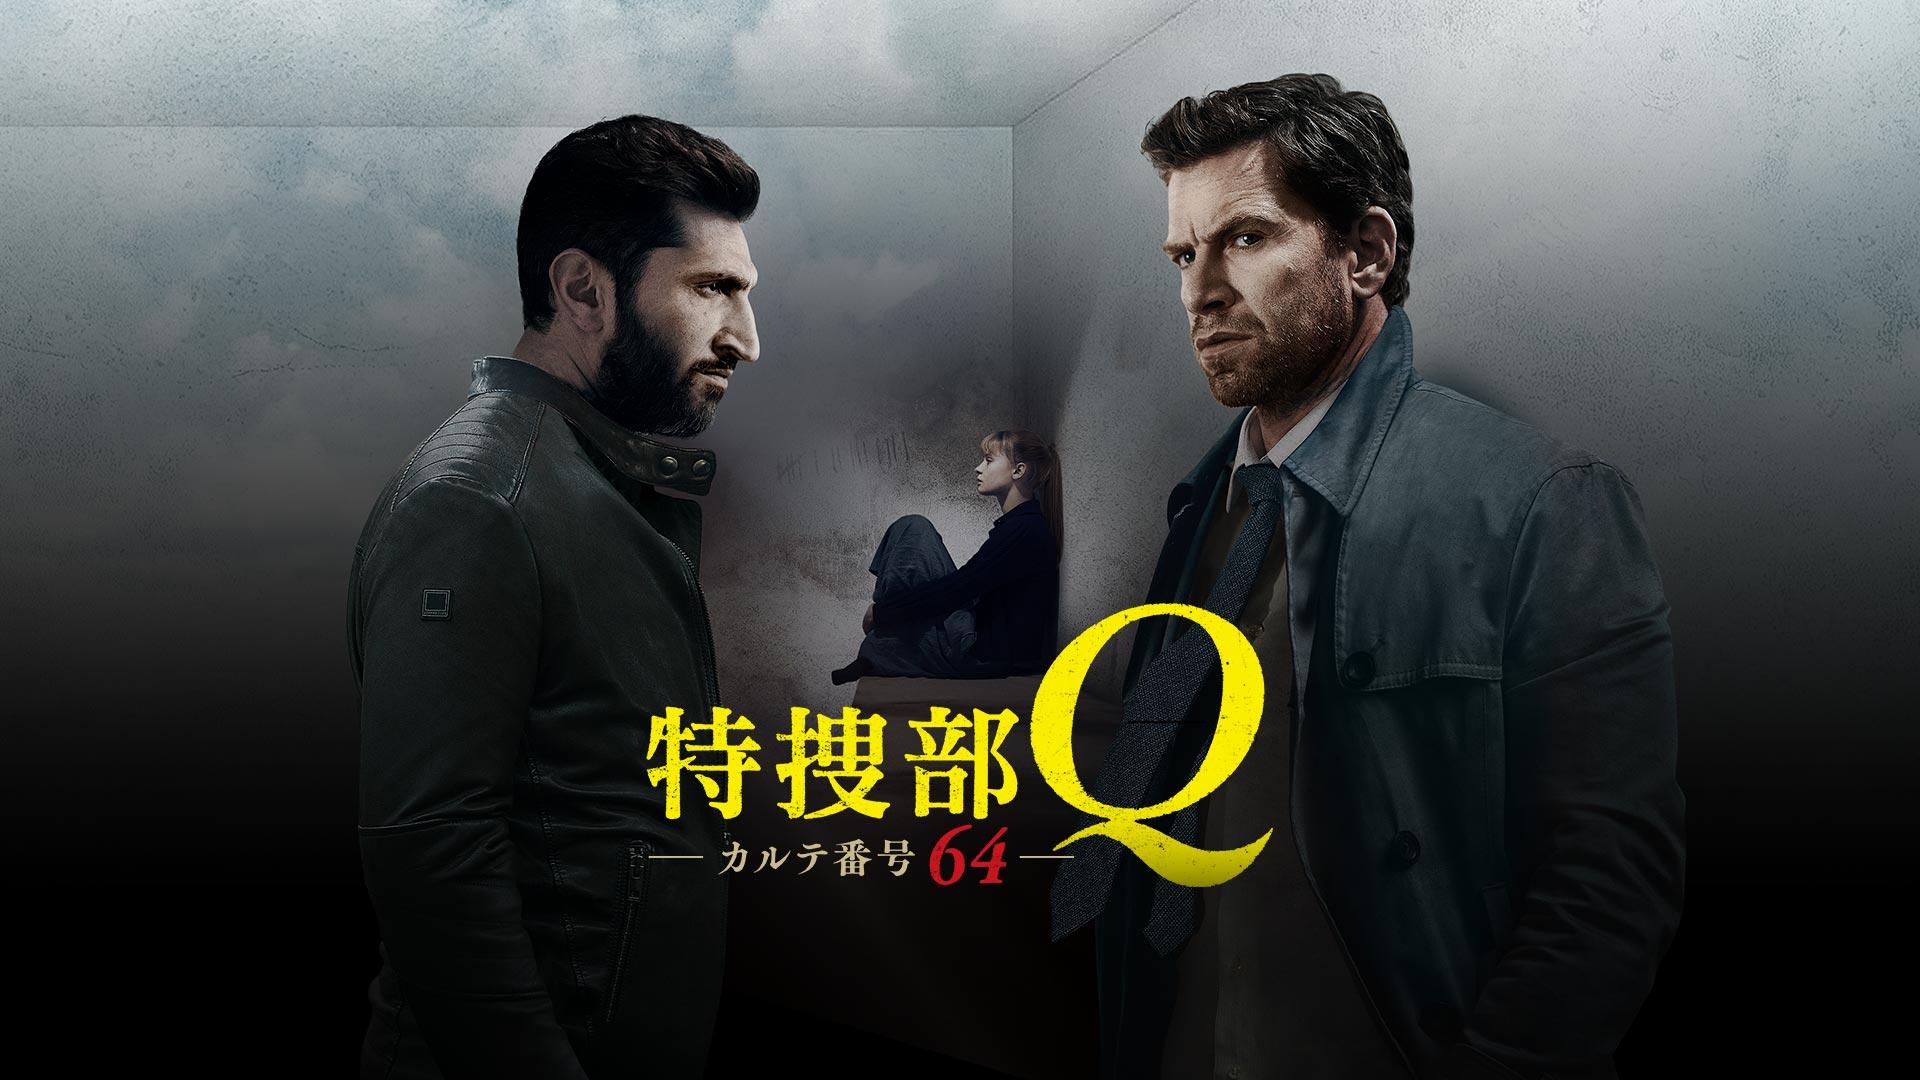 特捜部Q カルテ番号64(字幕版)